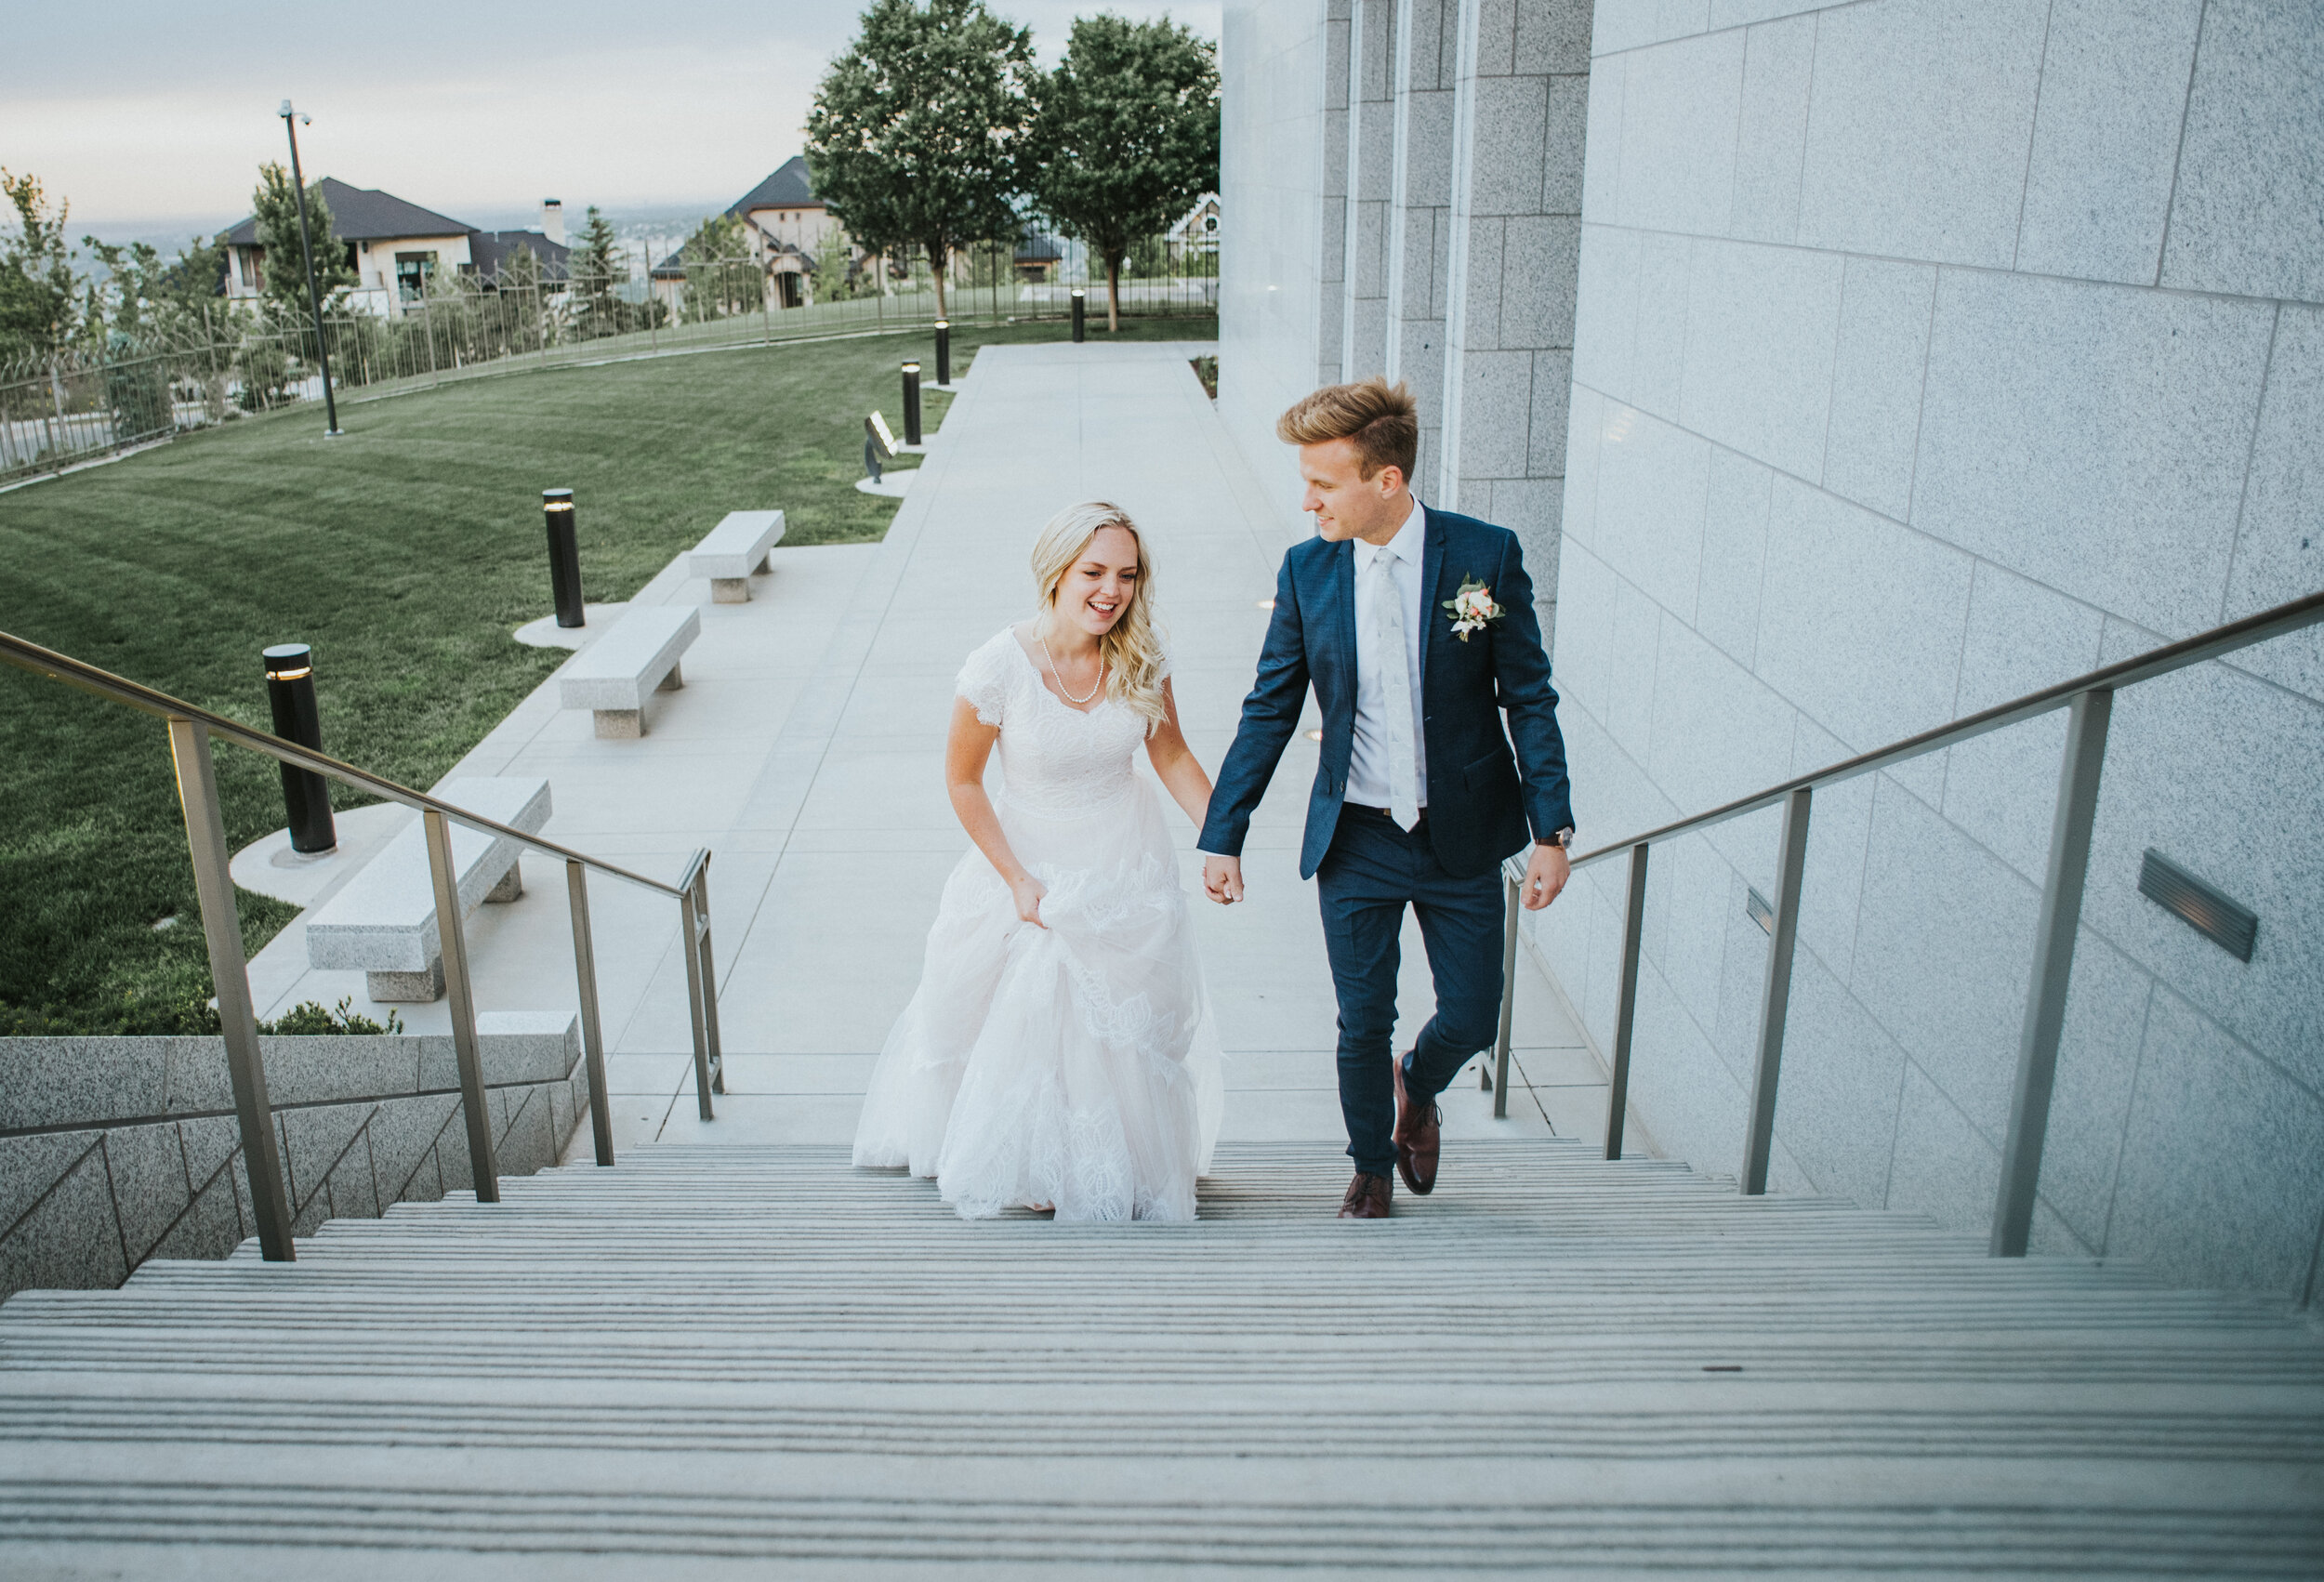 wedding_couple_walking_up_strairs.JPG